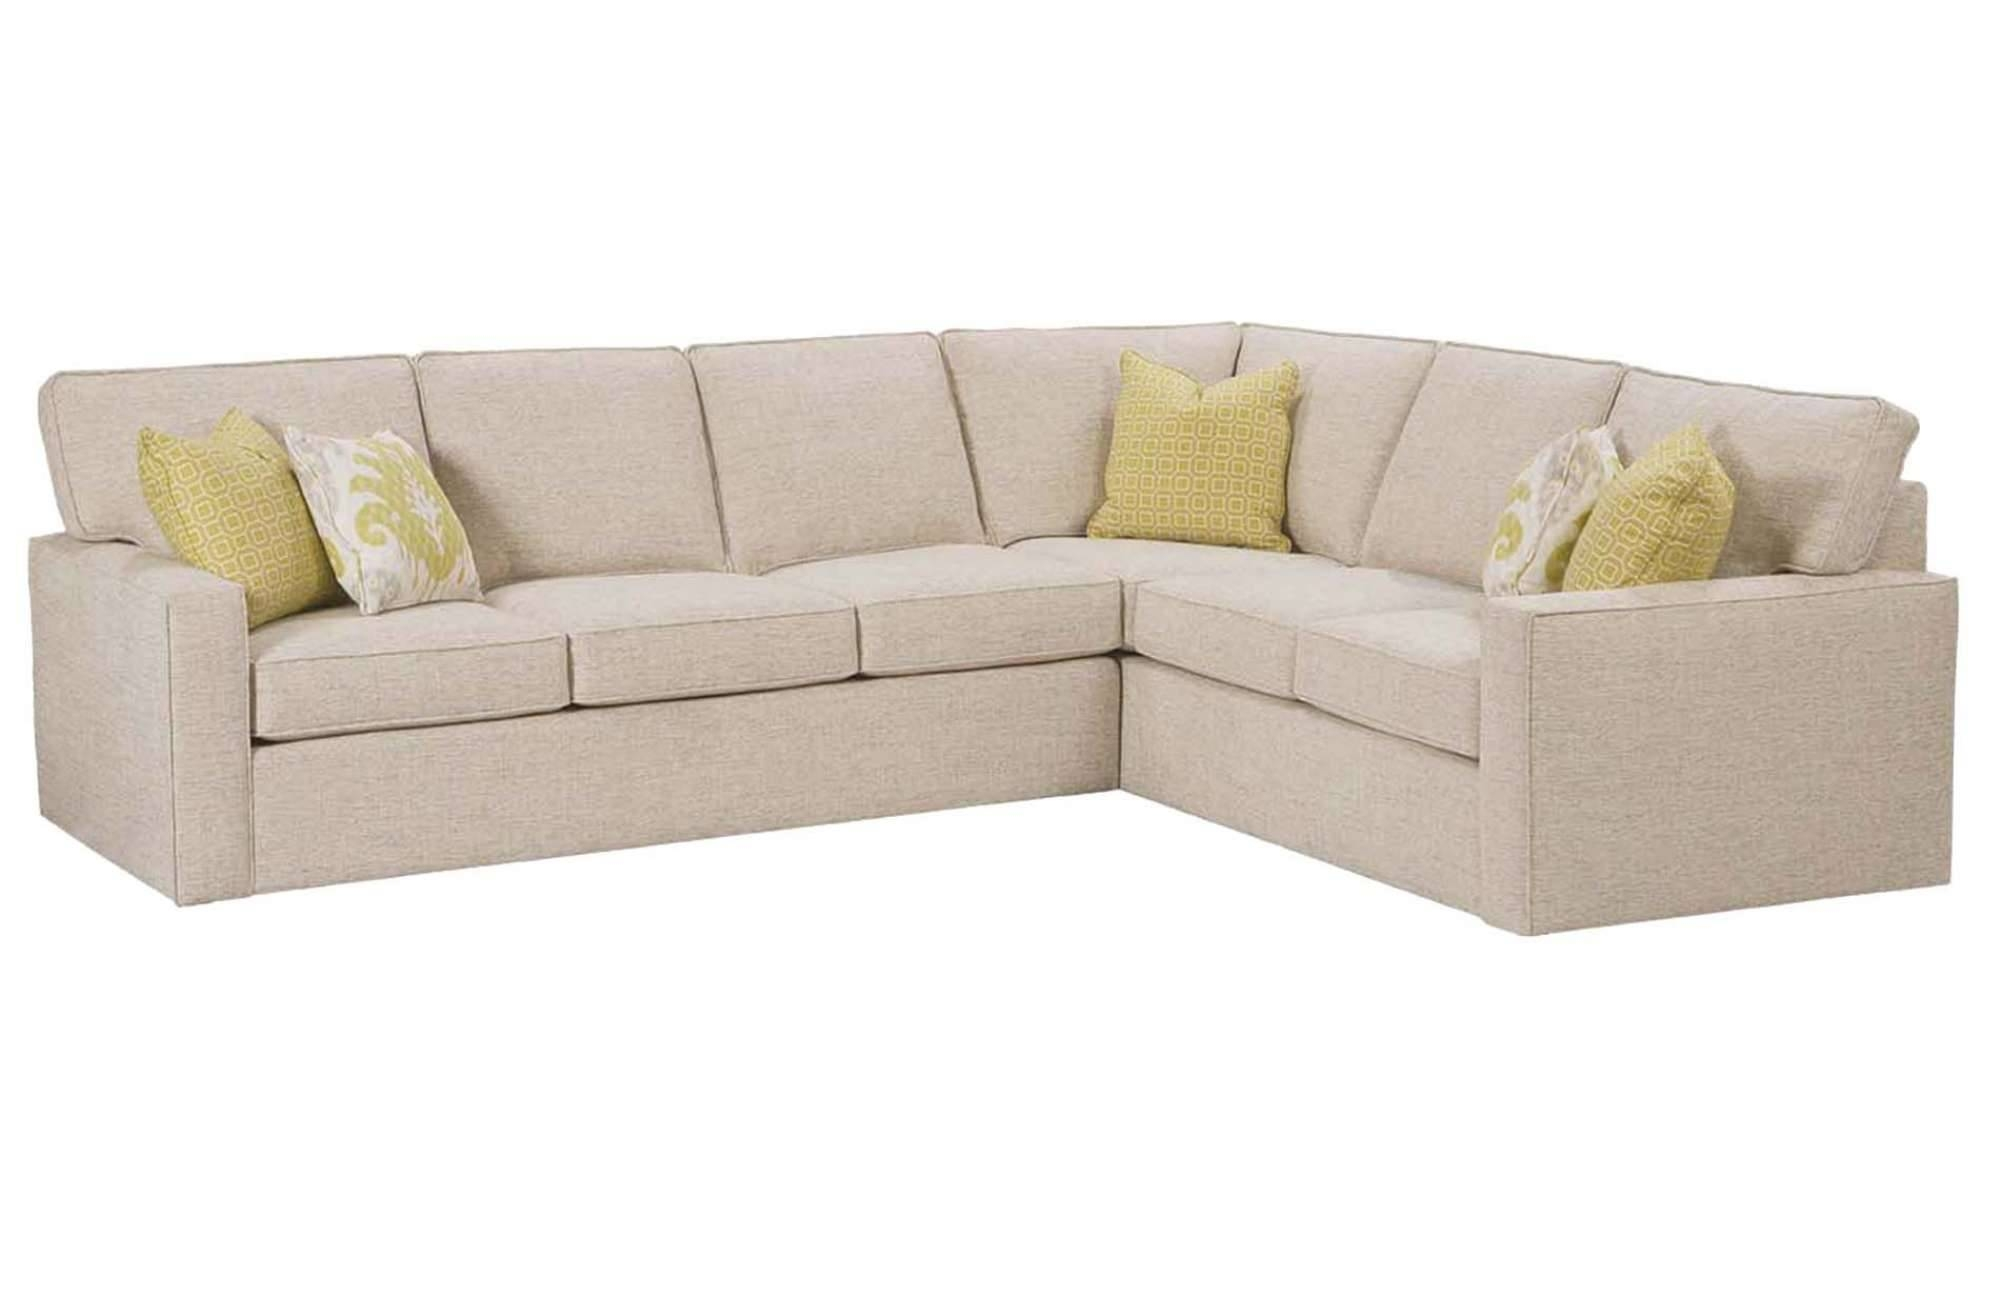 Monaco Sectionalrowe Furniture regarding Rowe Sectional Sofas (Image 6 of 15)